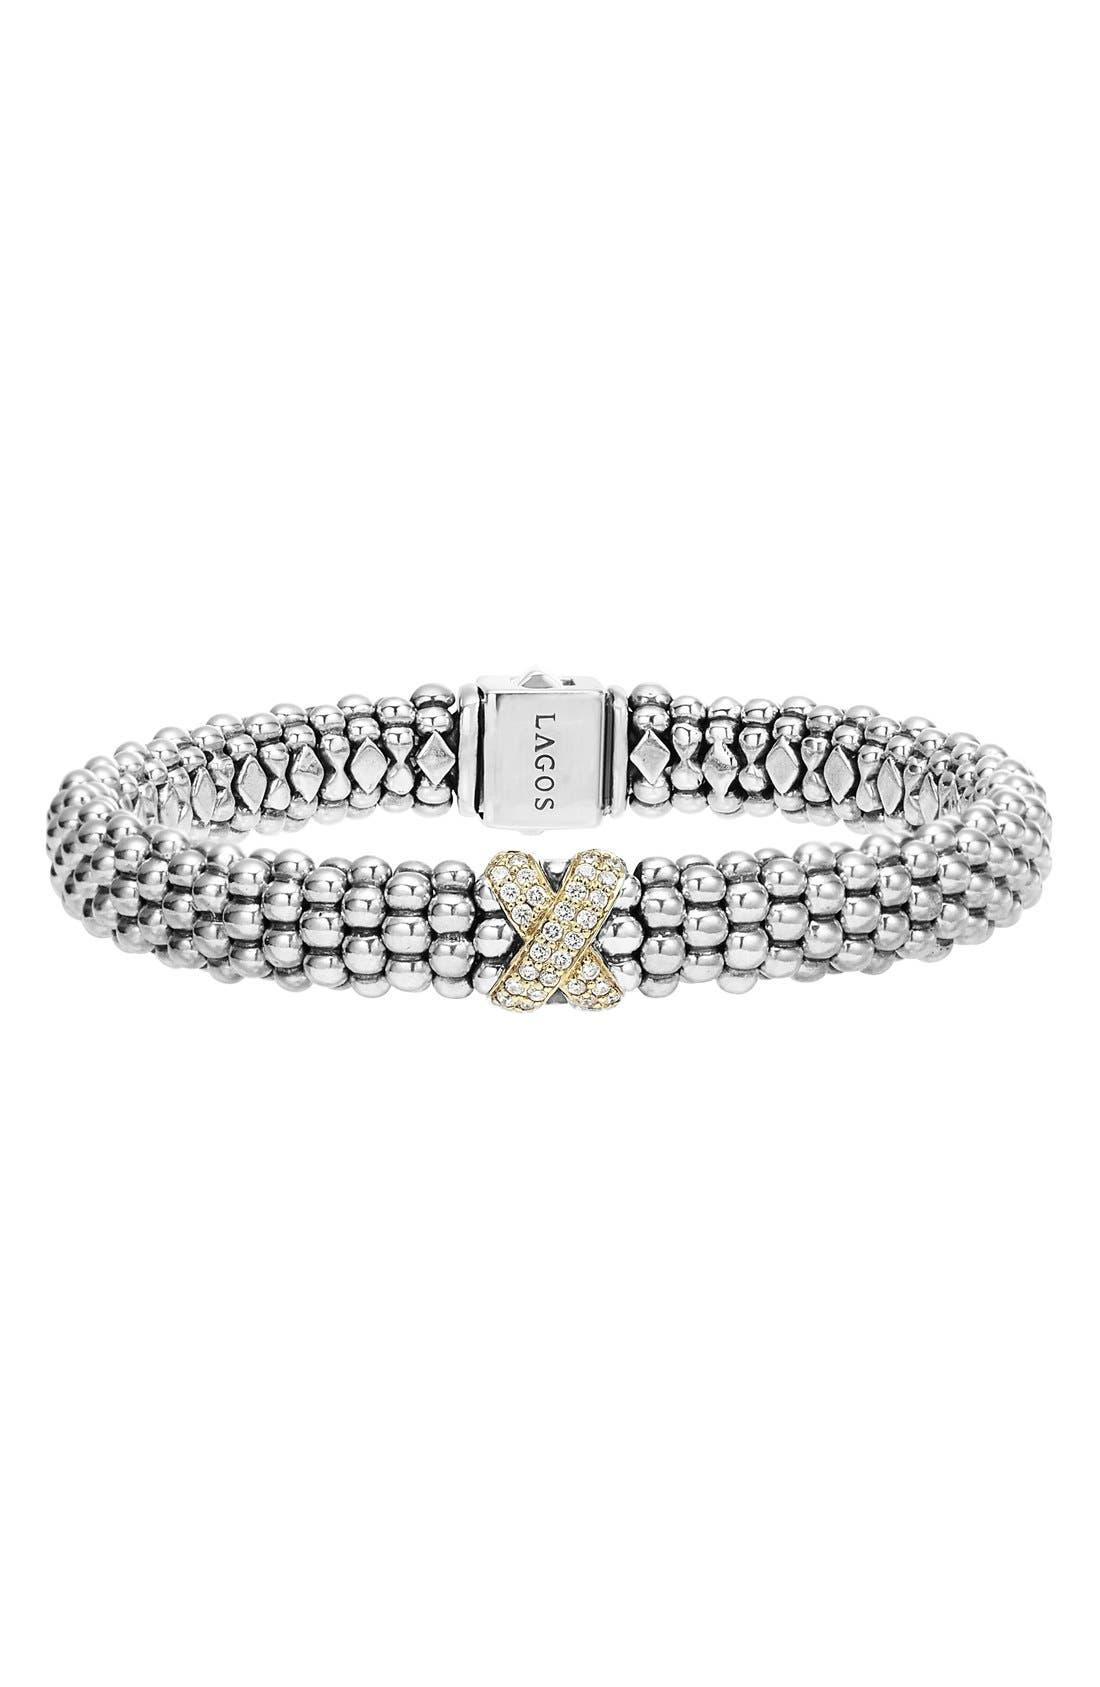 Alternate Image 1 Selected - LAGOS 'Caviar' Gold Diamond Rope Bracelet